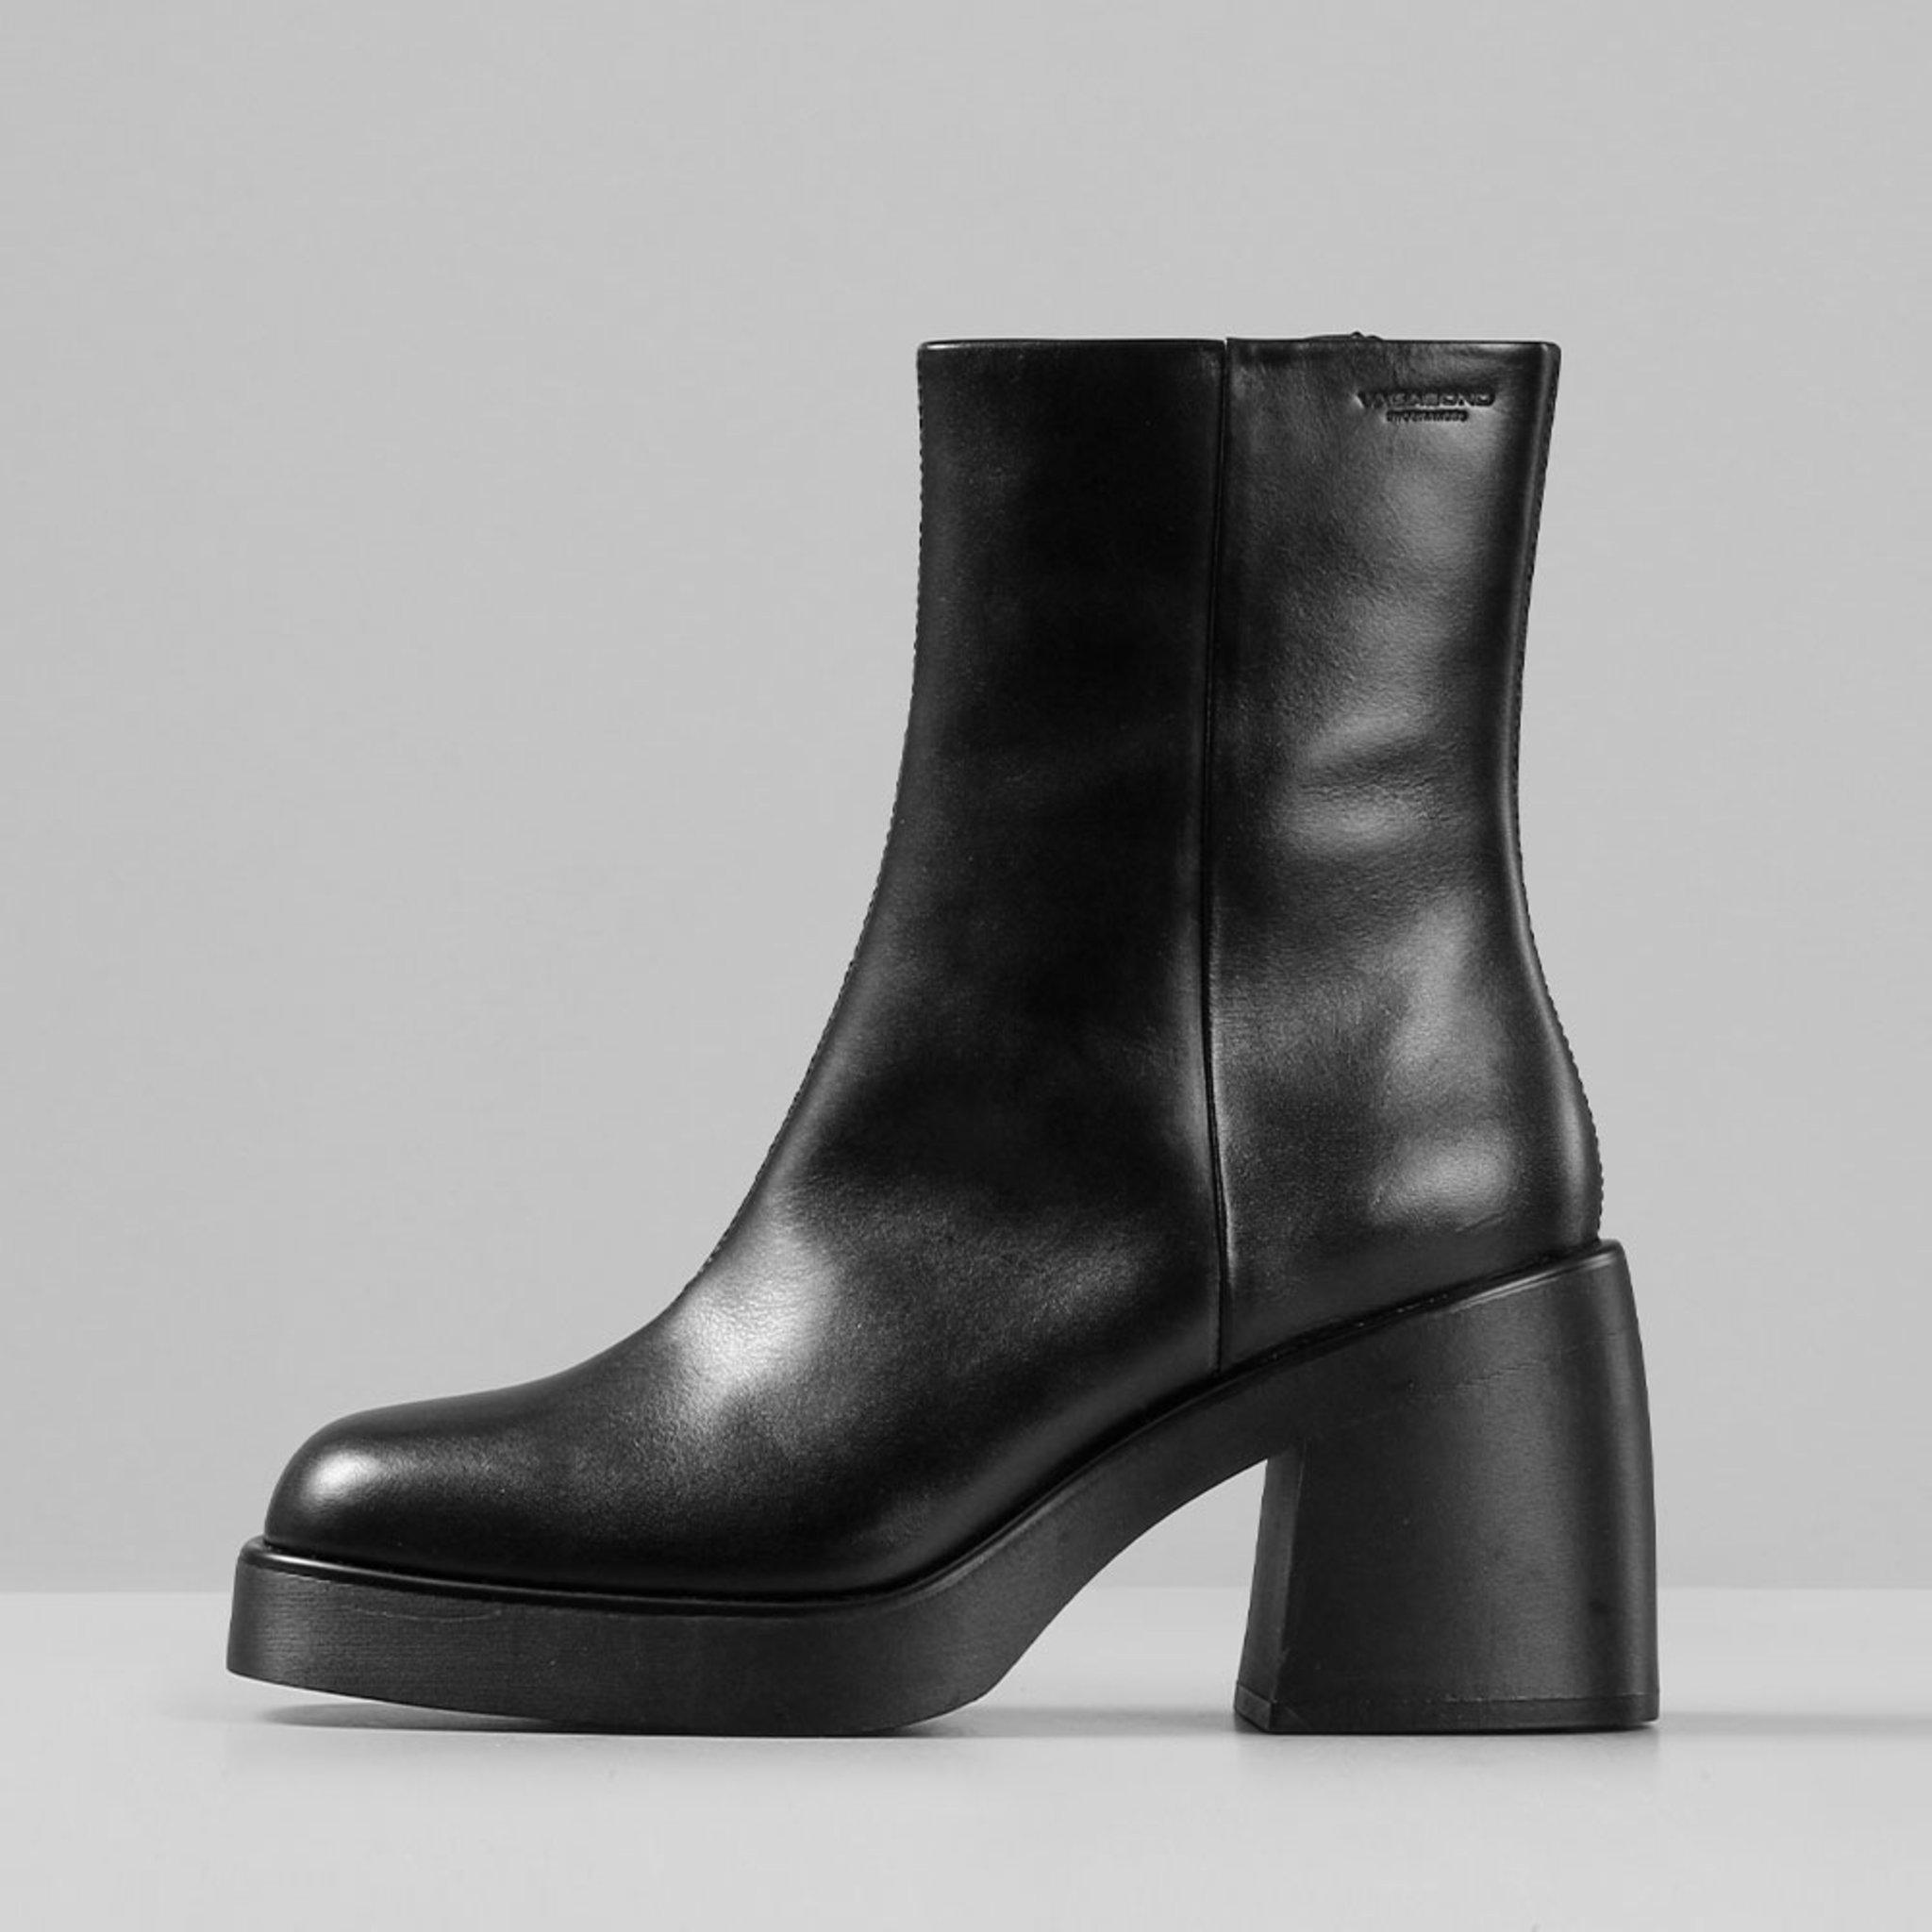 BROOKE Boots Heel Chunky